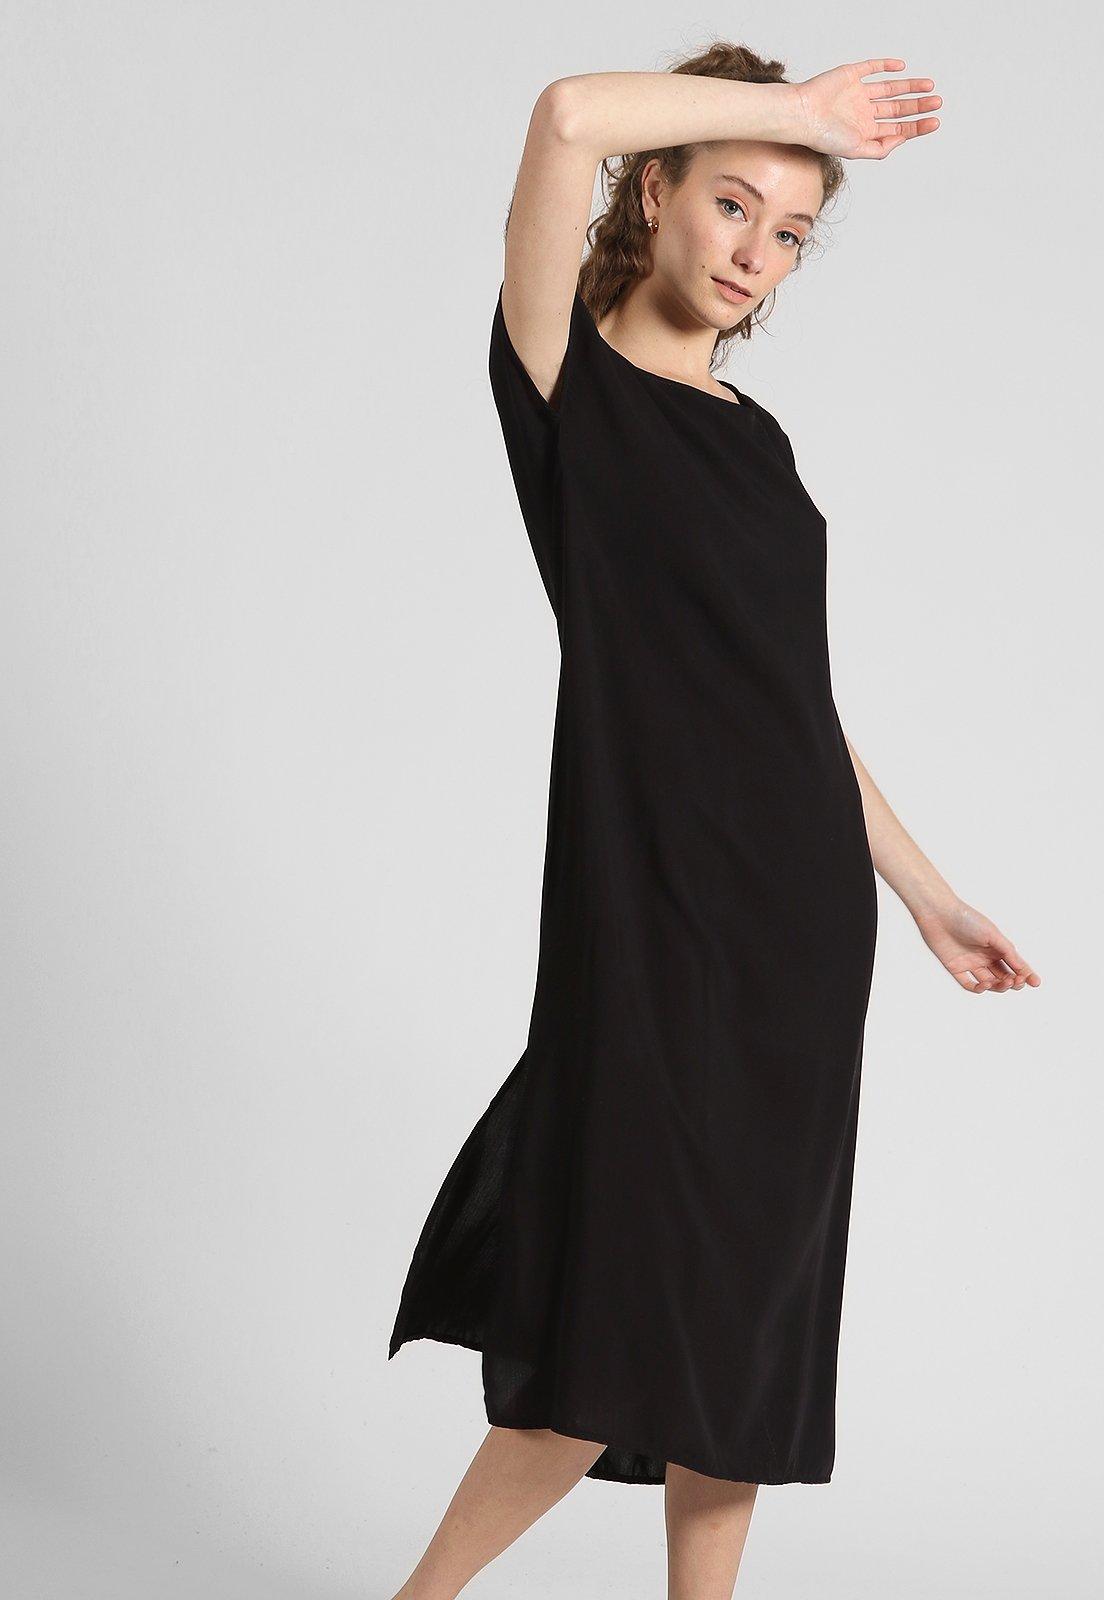 Vestido Negro Vespertine.